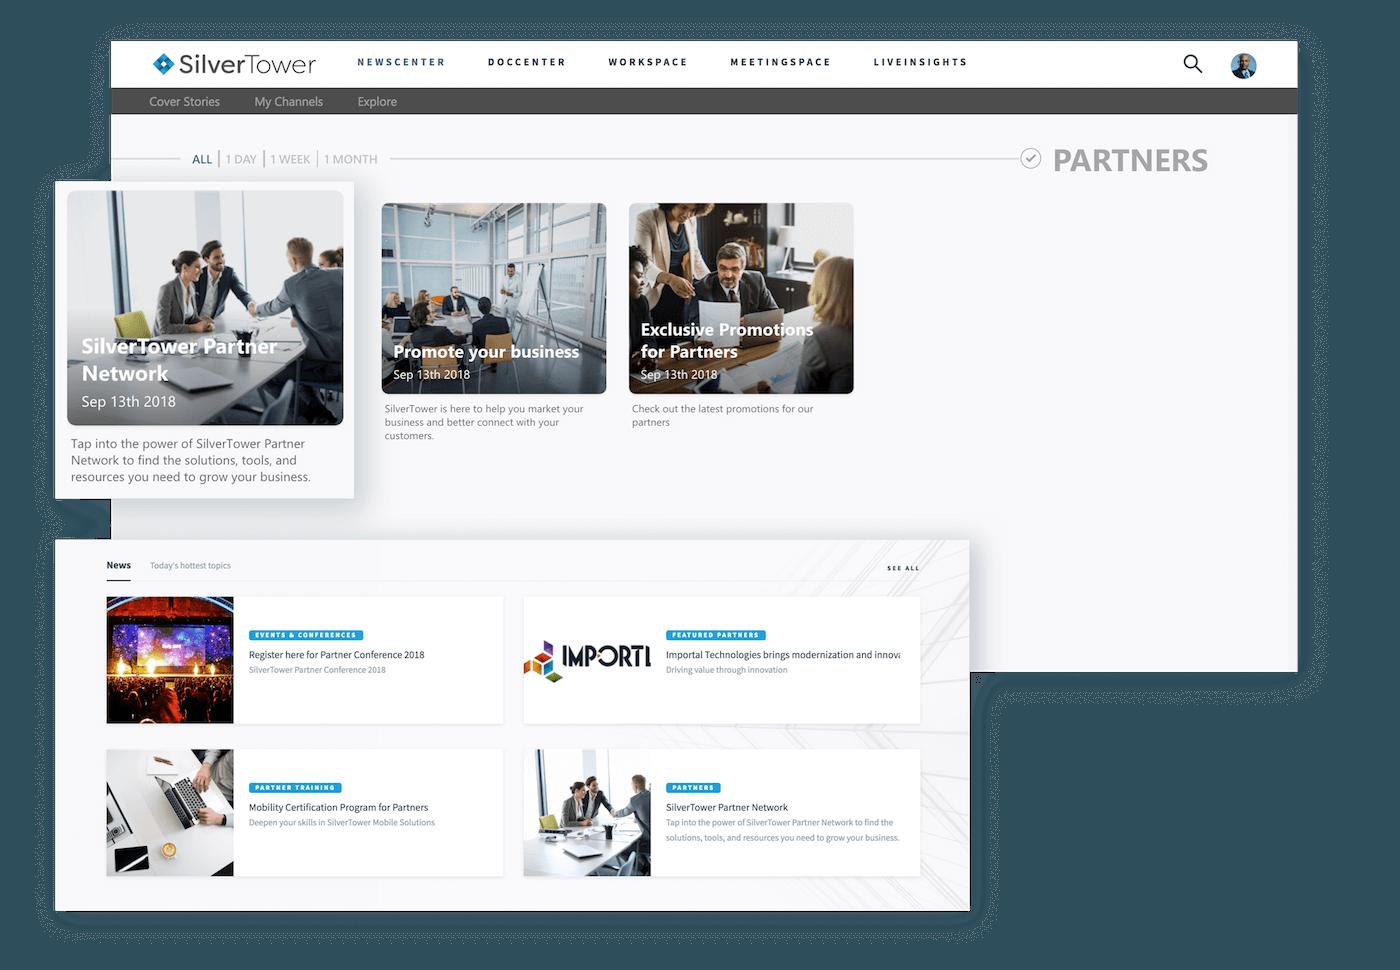 distribution-news-partners-newscenter-channel